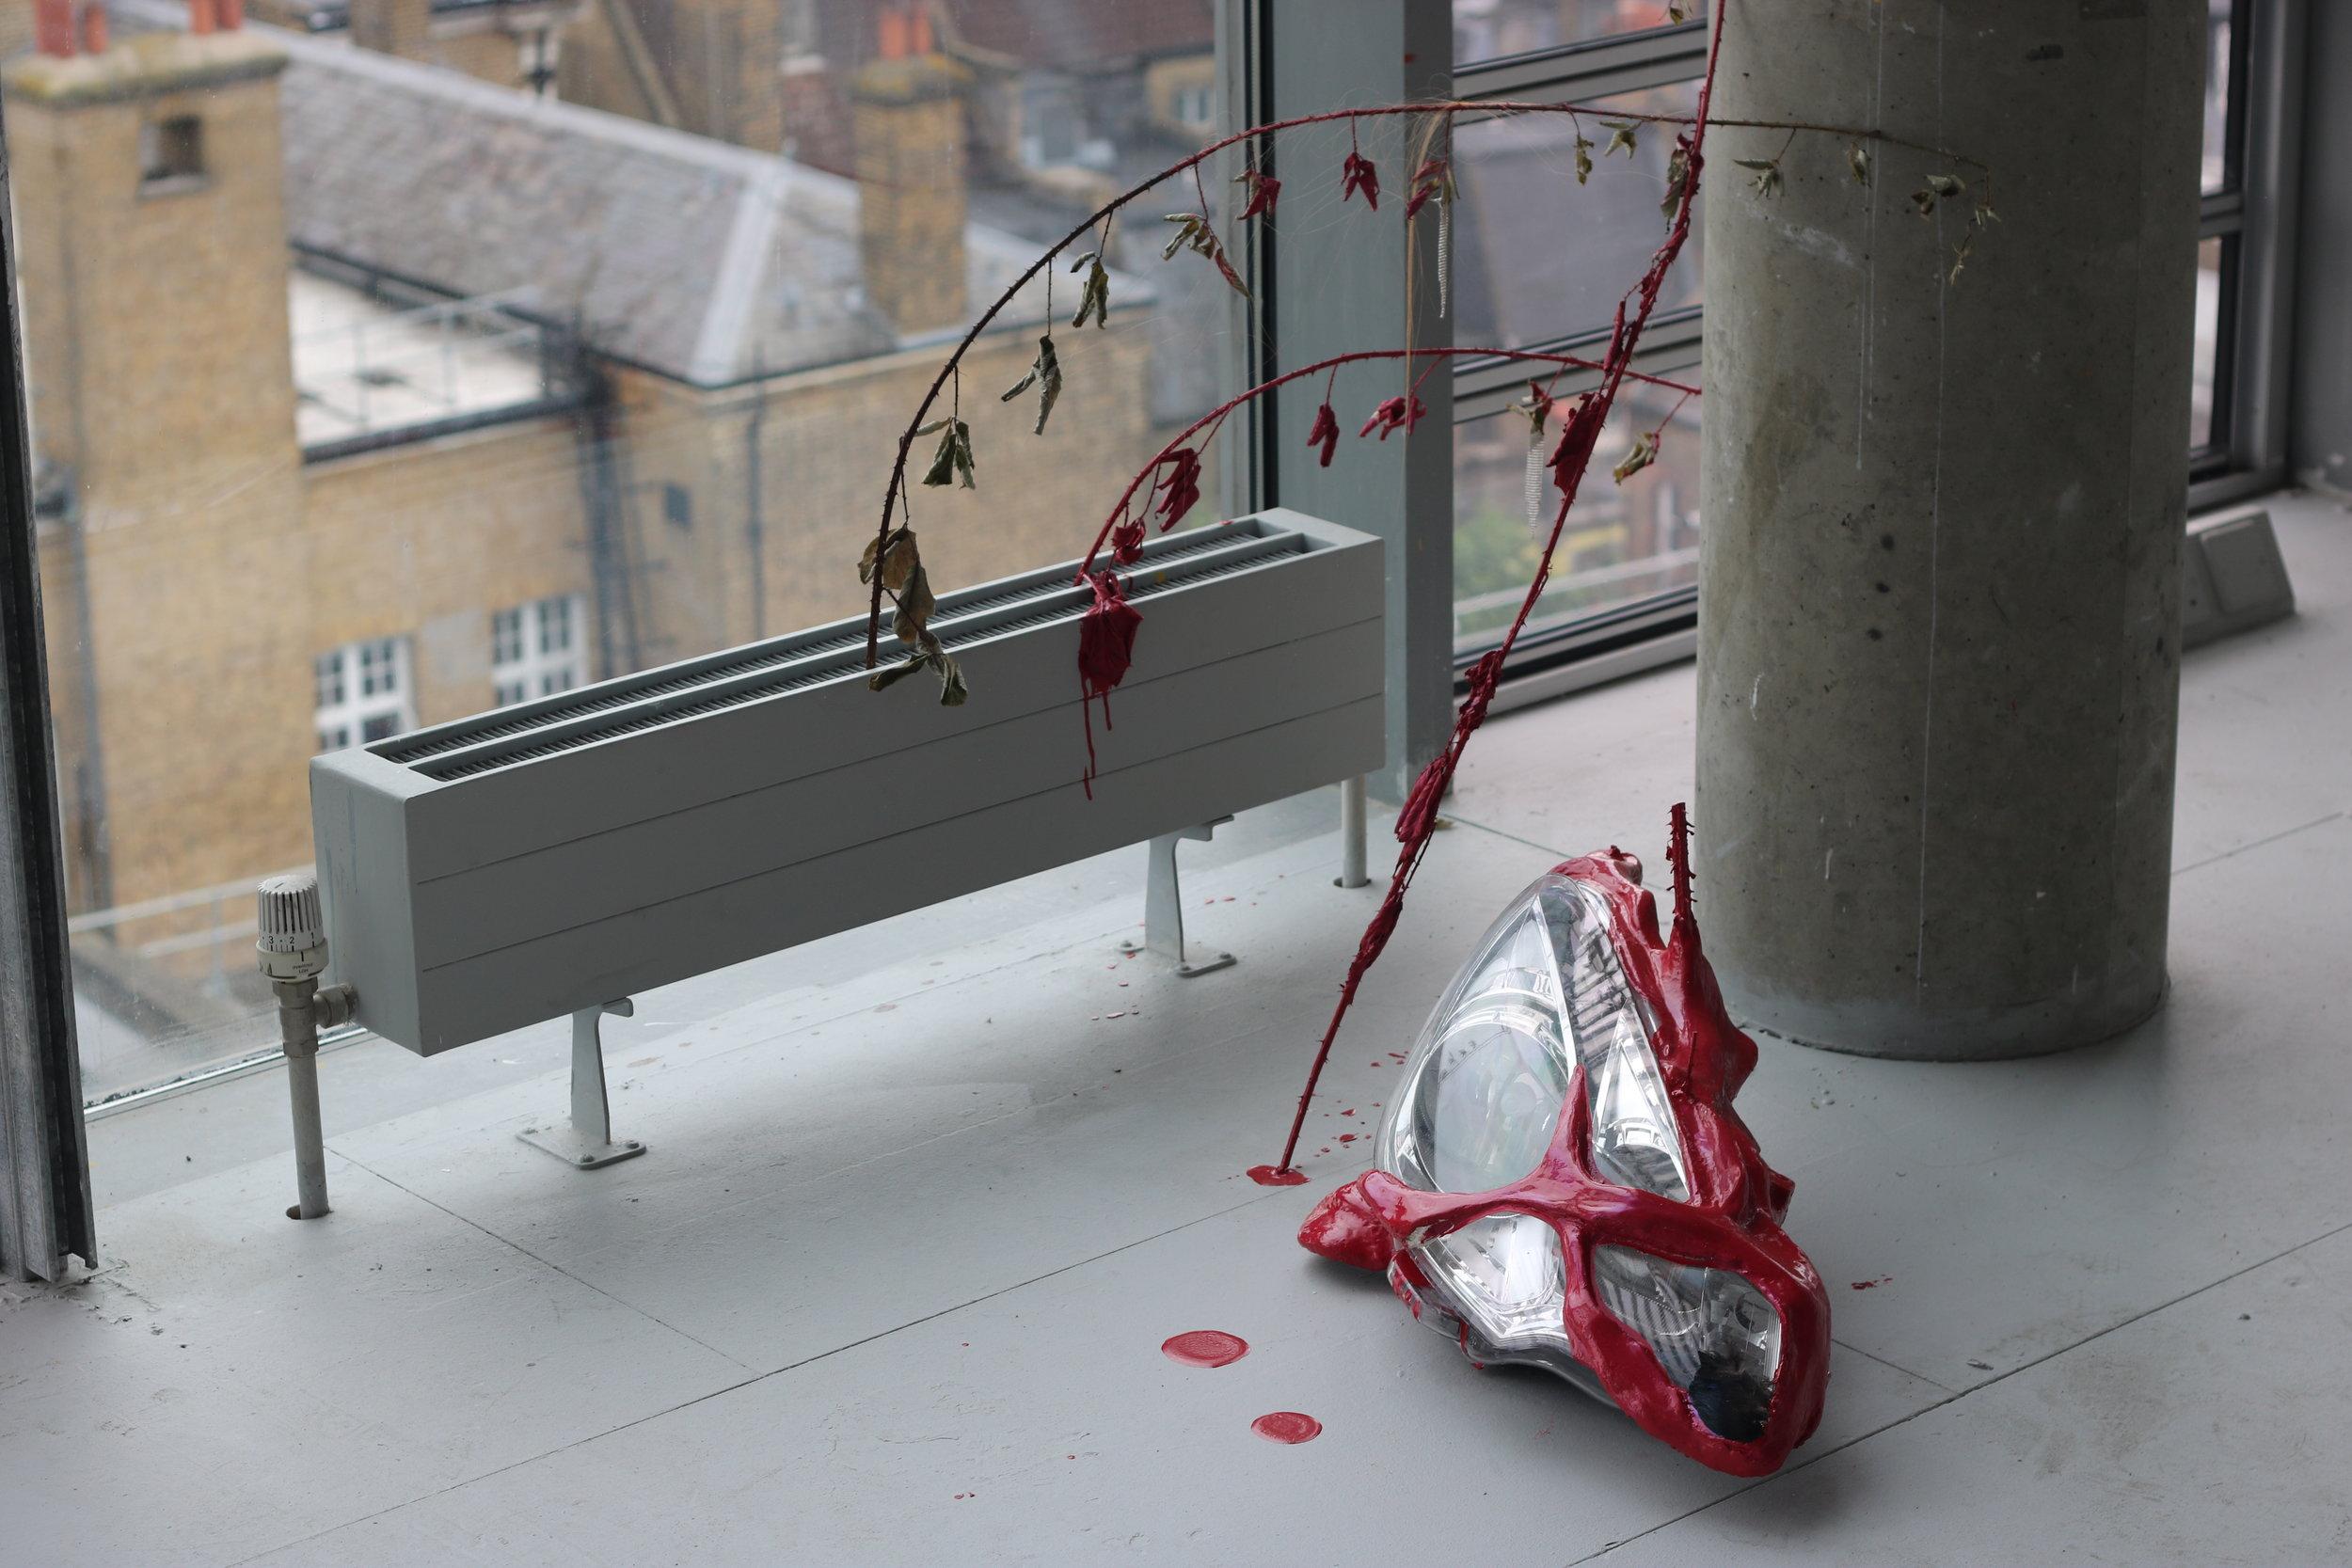 'changeling', car headlight, clay, bird wing, human hair, blackberry branches, rhinestone earrings, ferrari red automotive paint